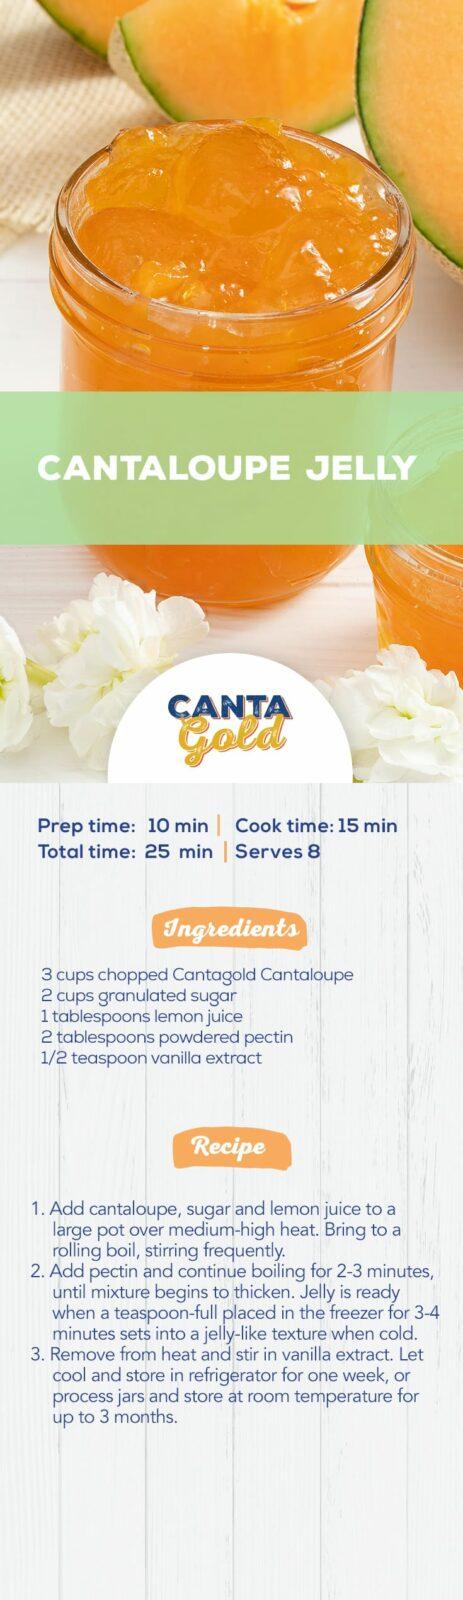 CantaGold_PinterestPinPinterest_Cantaloupe Jelly